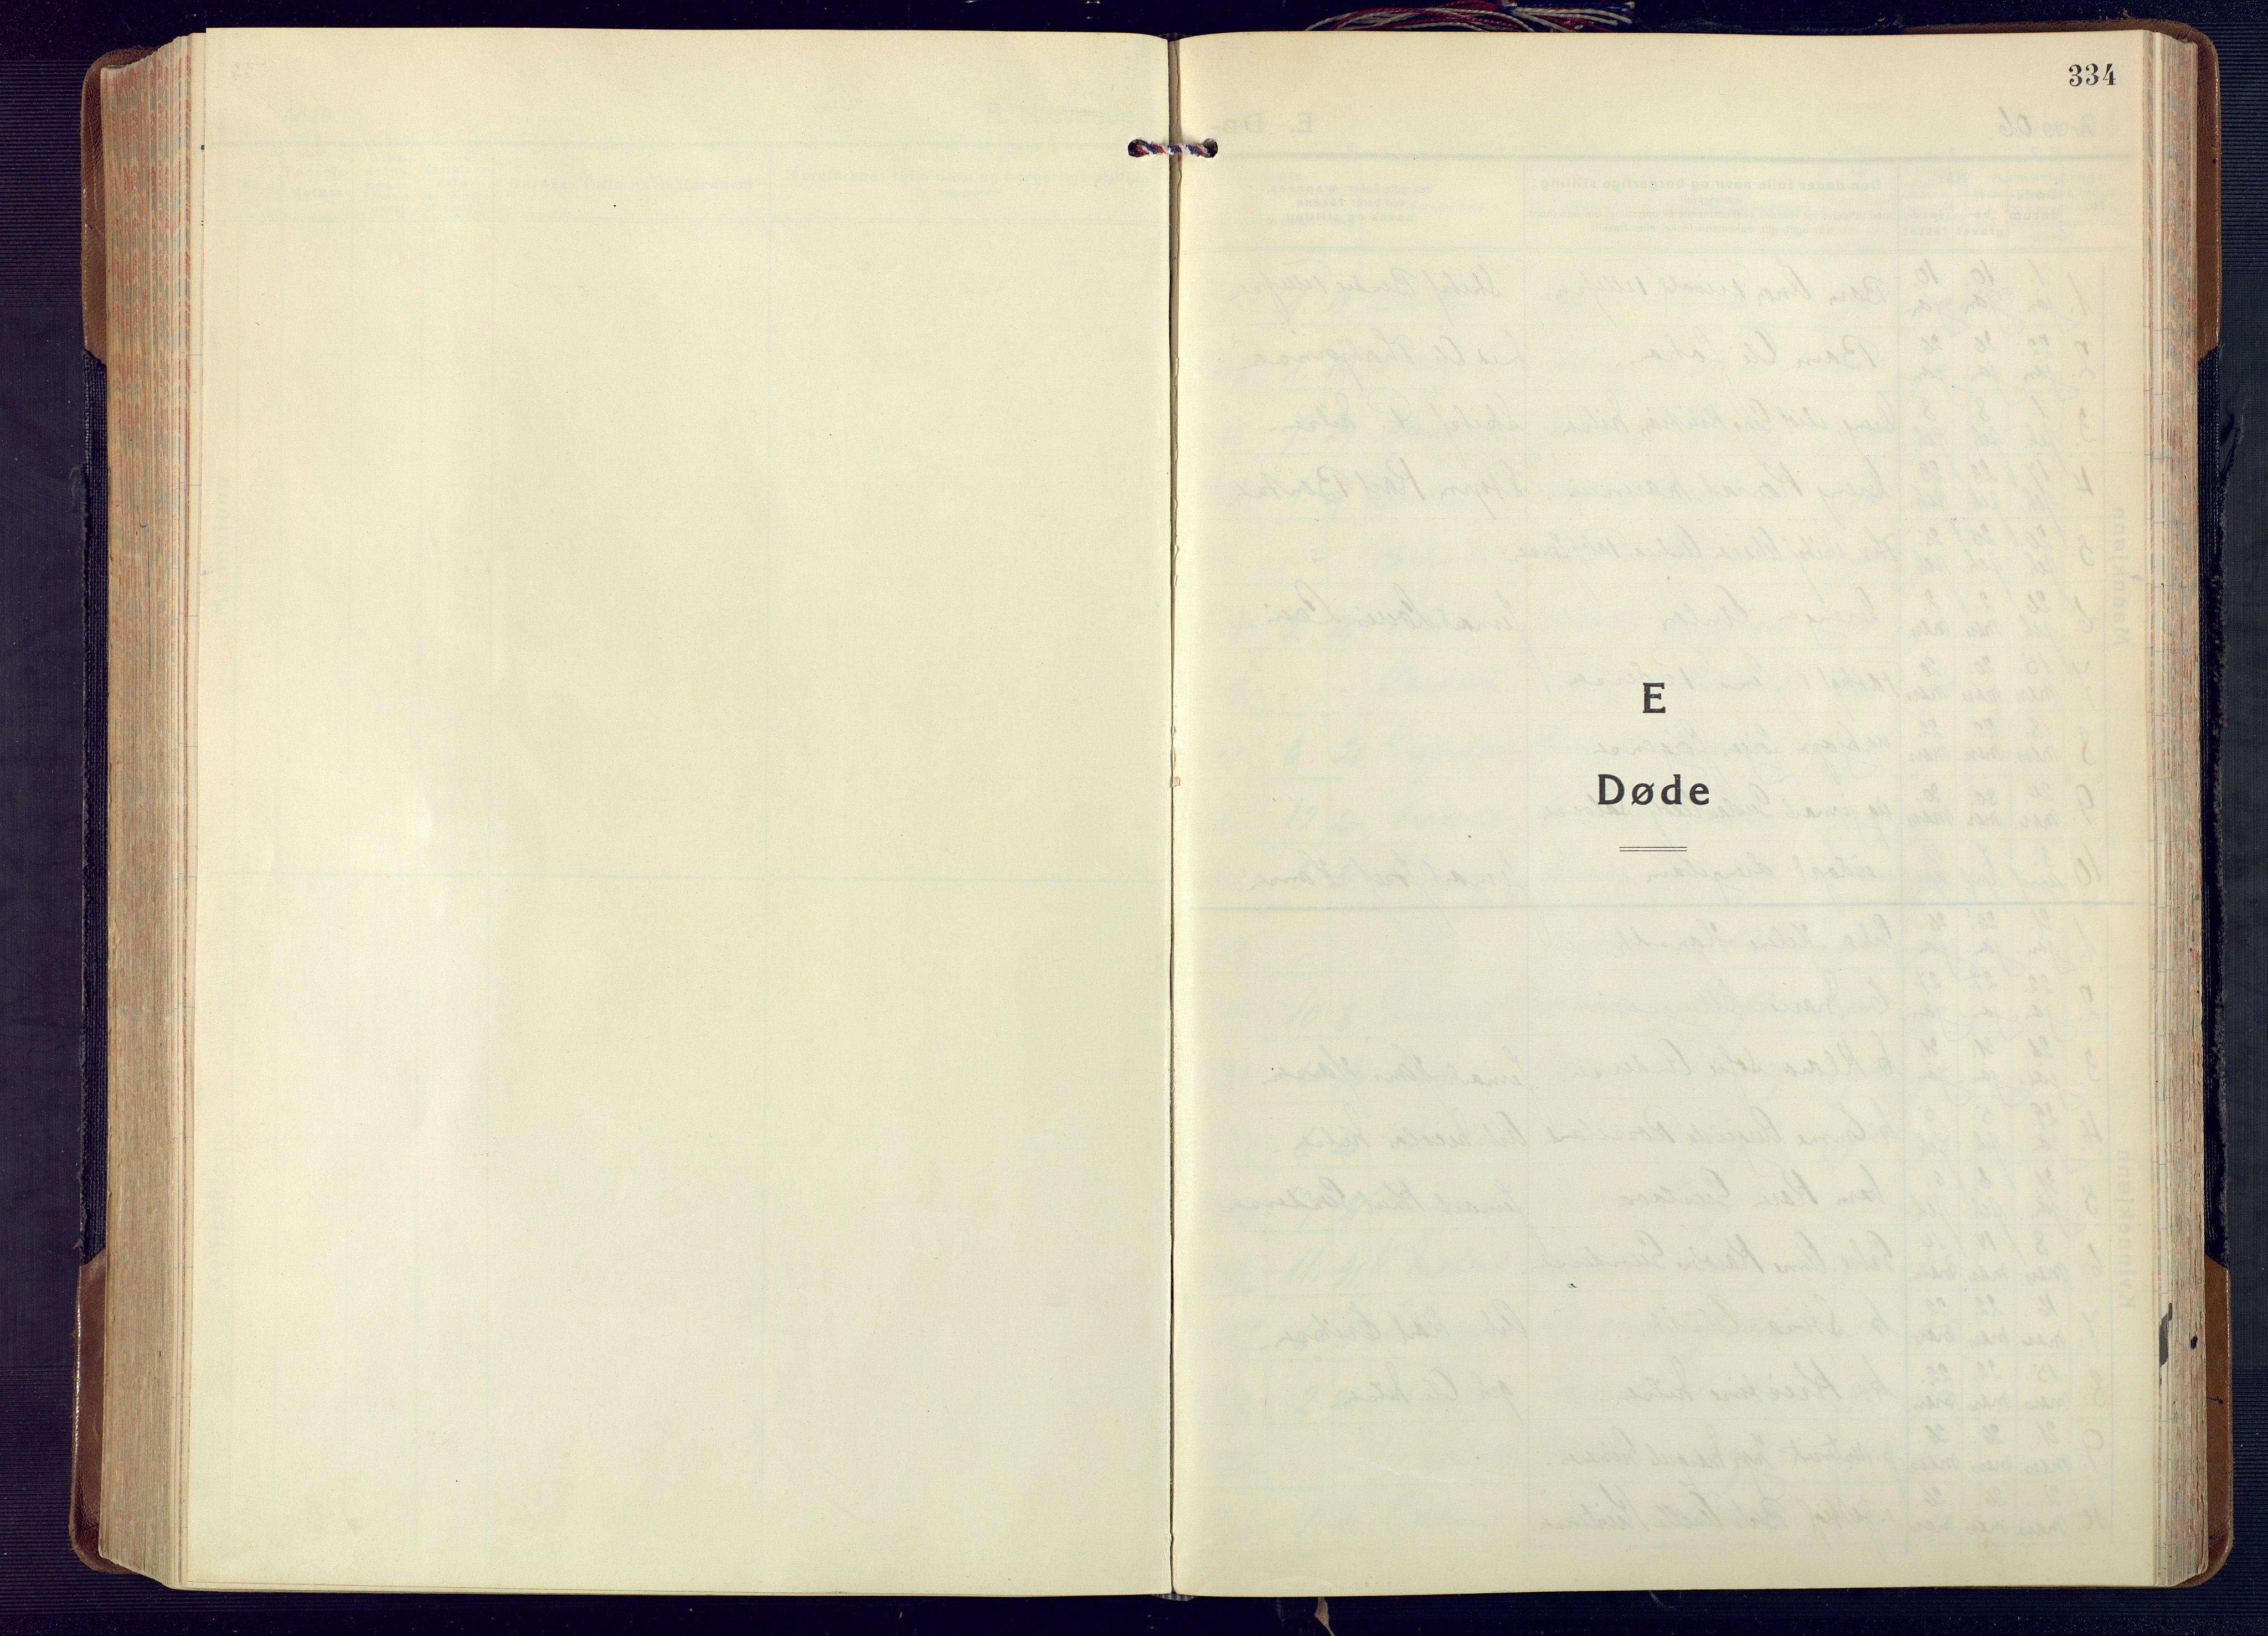 SAK, Fjære sokneprestkontor, F/Fa/L0004: Ministerialbok nr. A 4, 1902-1925, s. 334